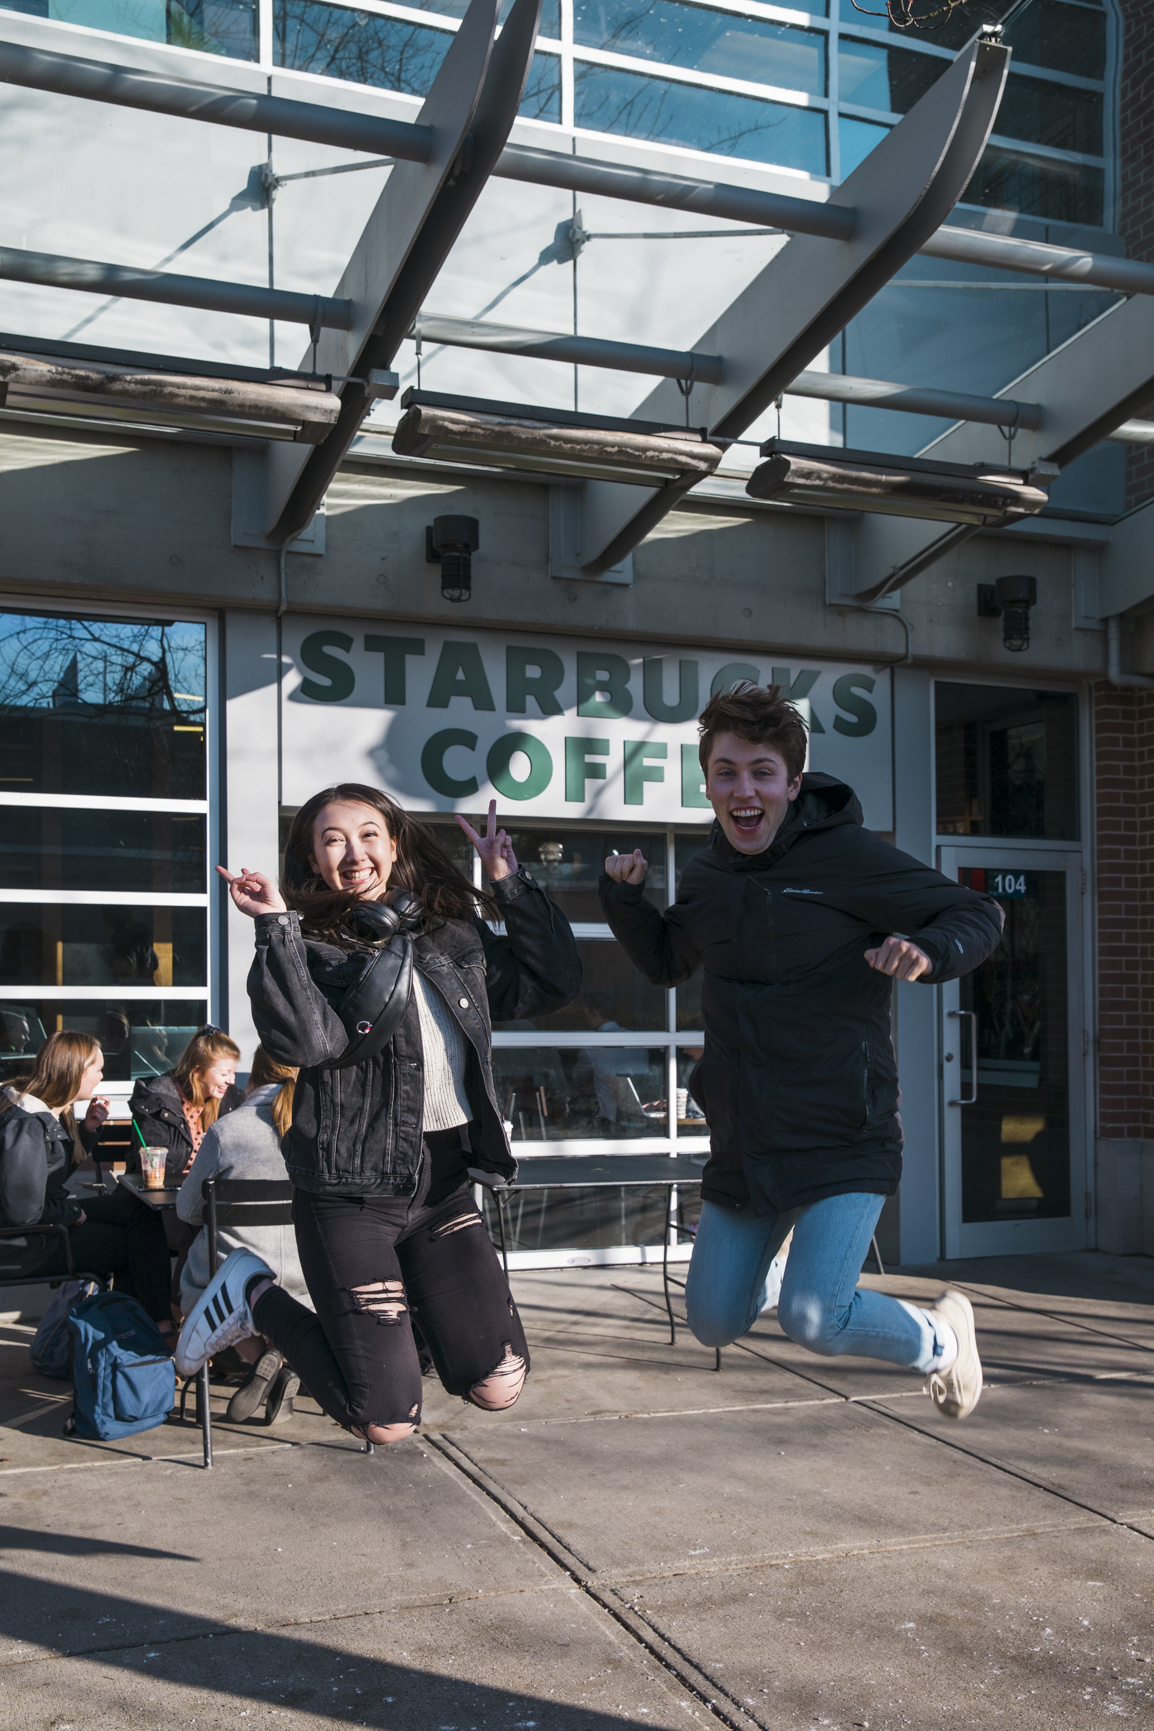 Jordan and Kana jumping in front of Starbucks